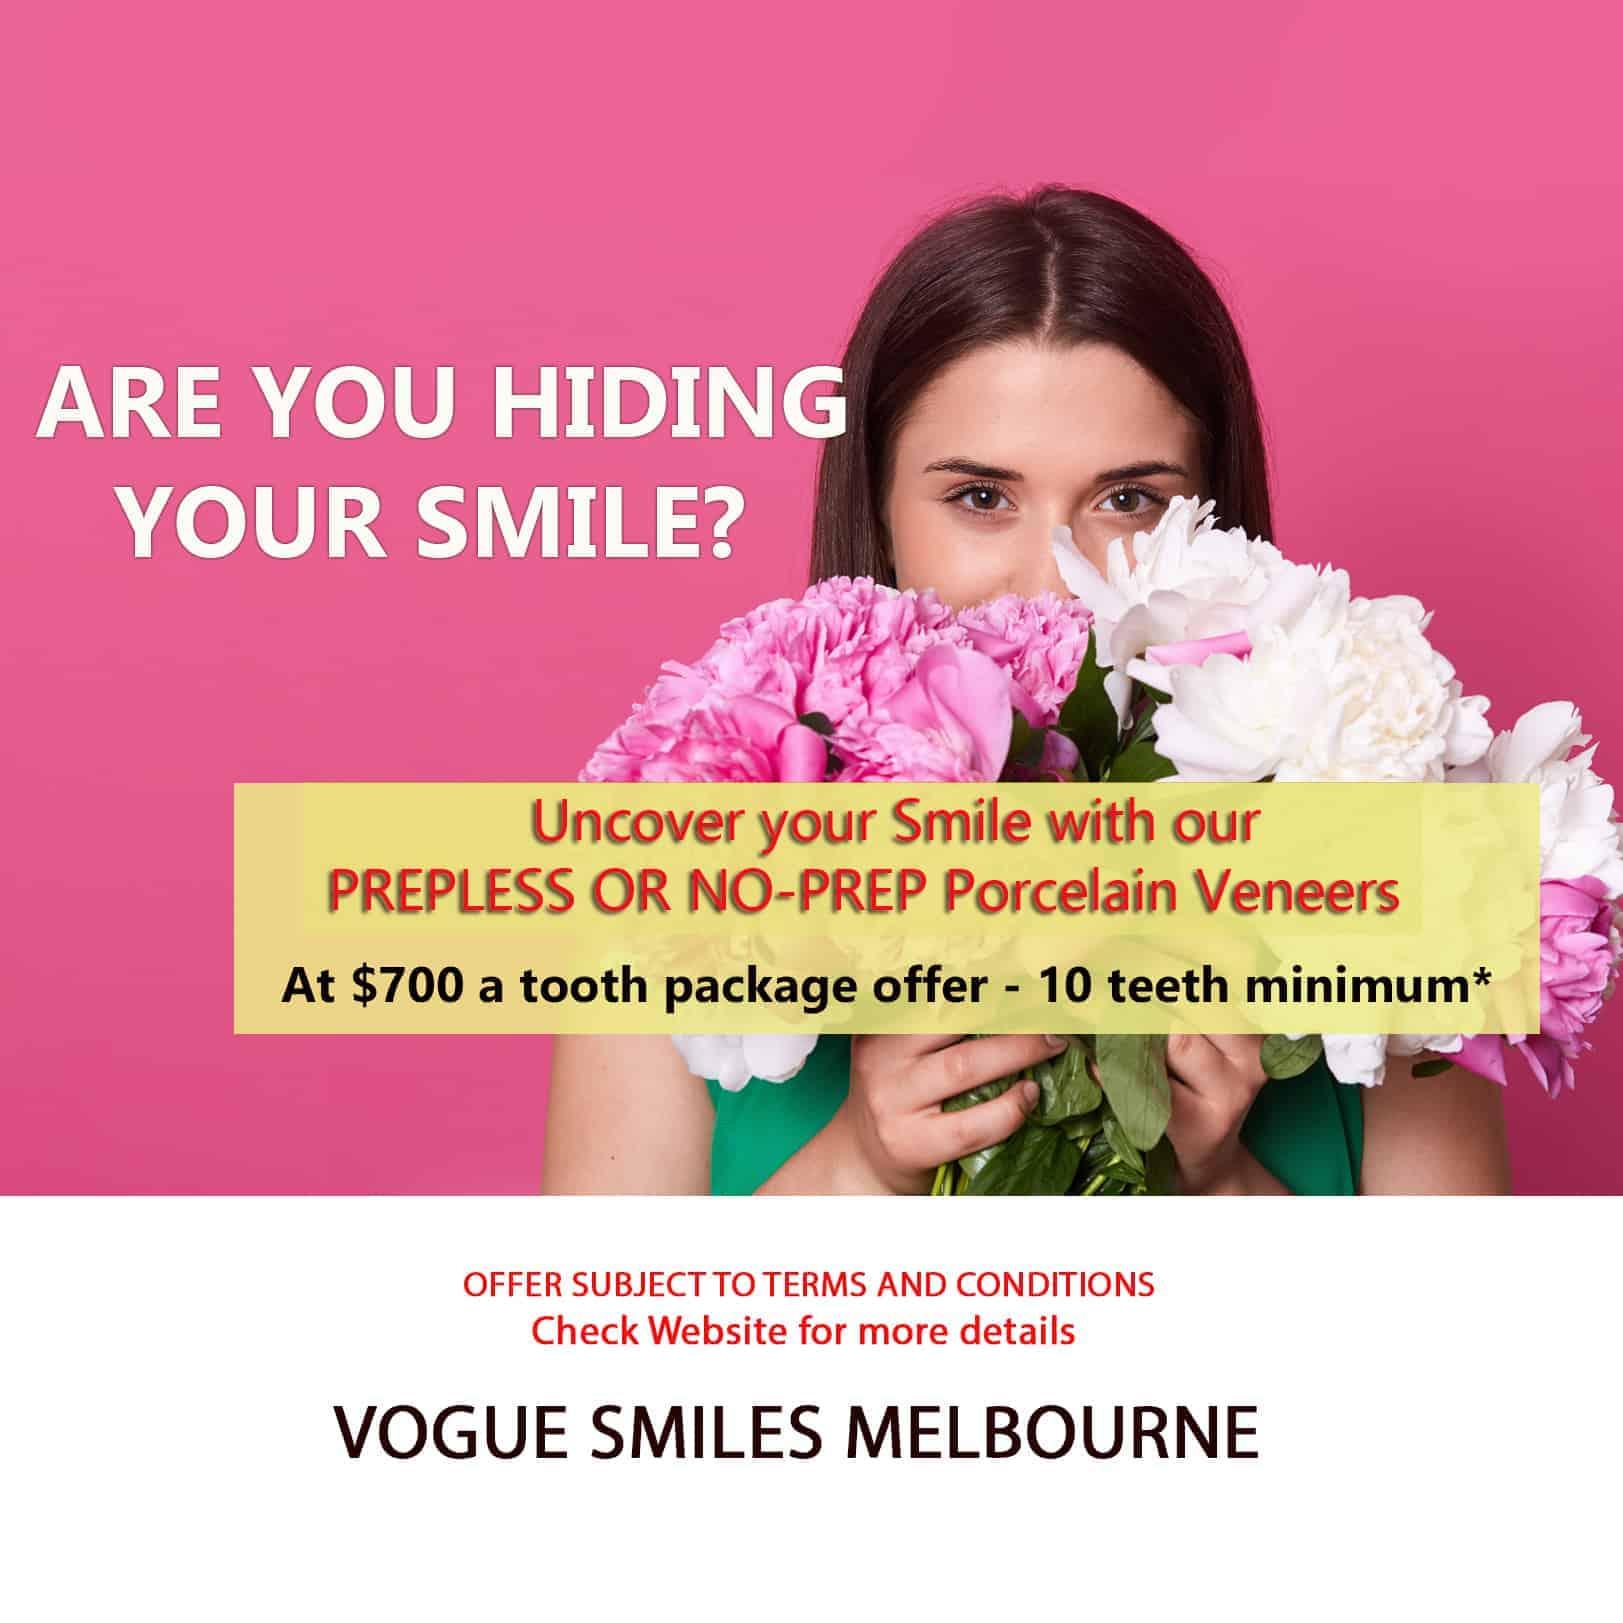 Best Cosmetic Dentist Melbourne - Top Cosmetic Dentist in Melbourne Australia - Dr Zenaidy Castro VOGUE SMILES MELBOURNE